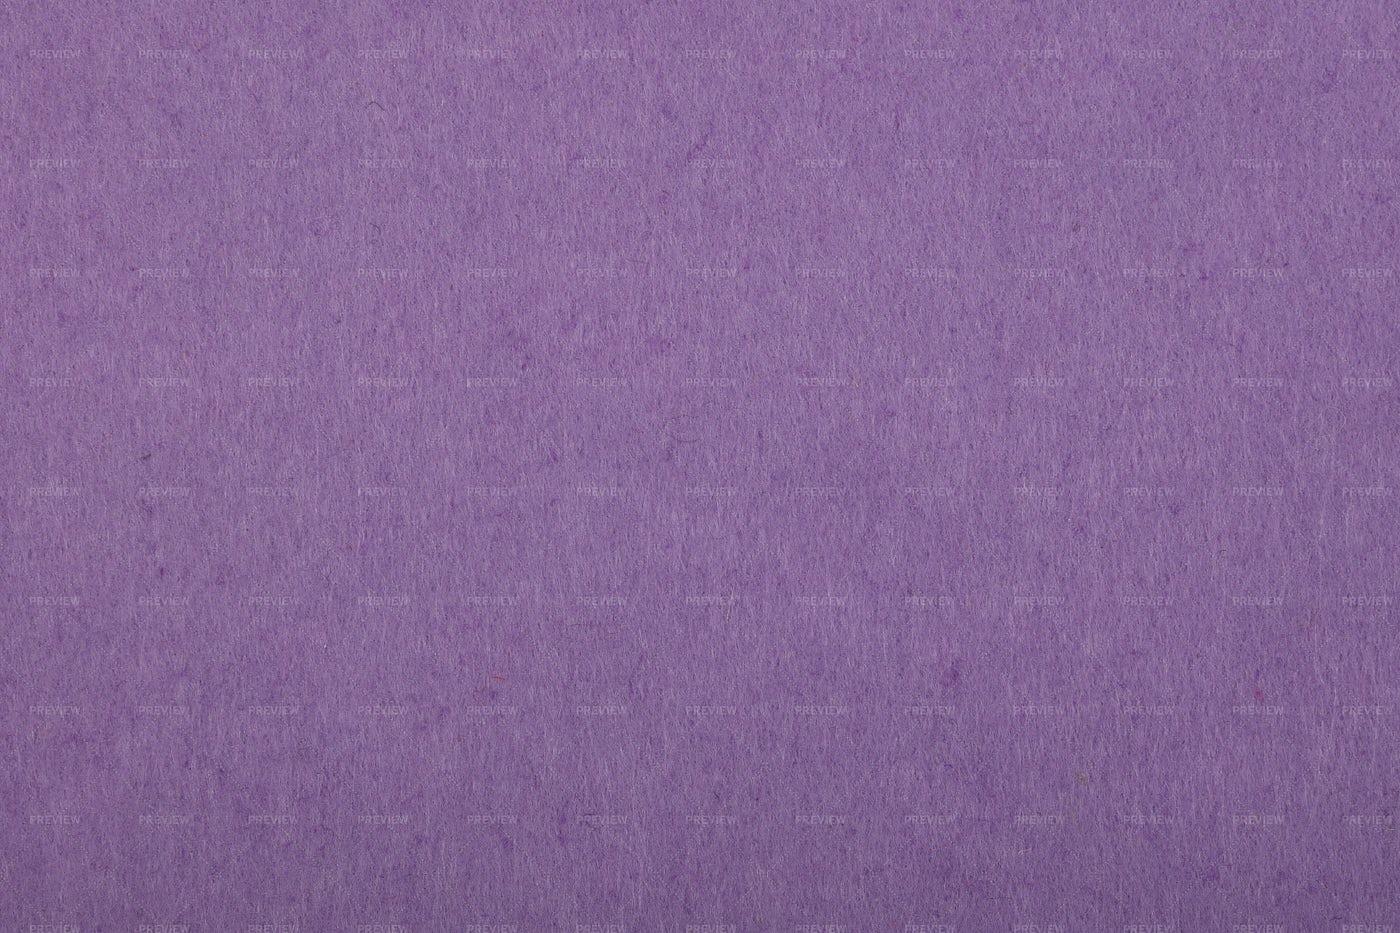 Purple Felt Background Texture: Stock Photos